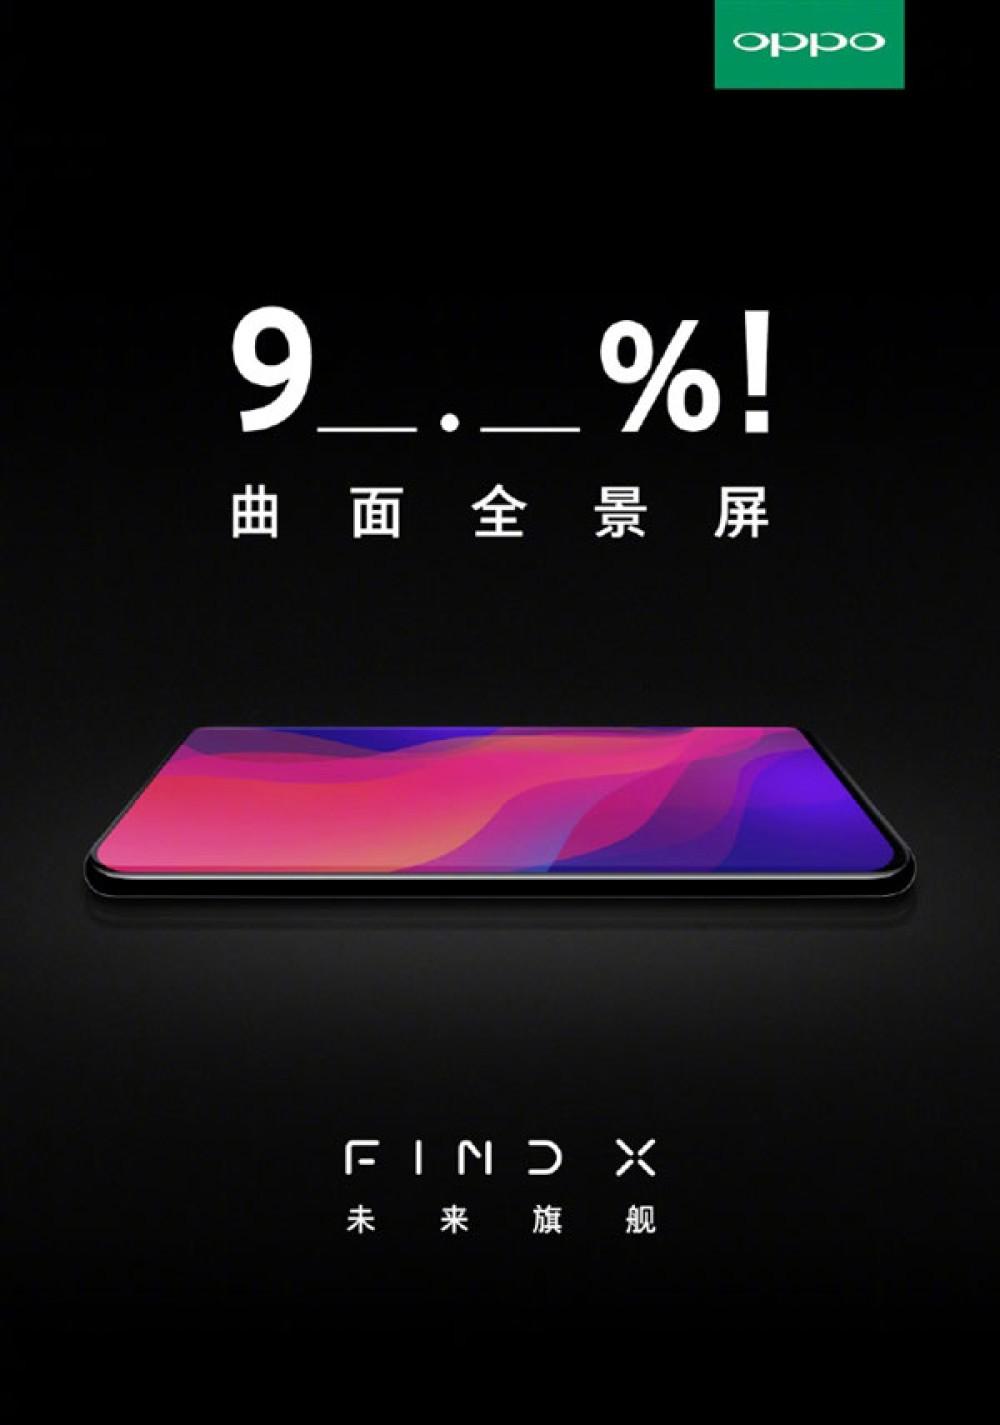 Oppo Find X: Νέα teaser posters αποκαλύπτουν all-screen οθόνη χωρίς notch